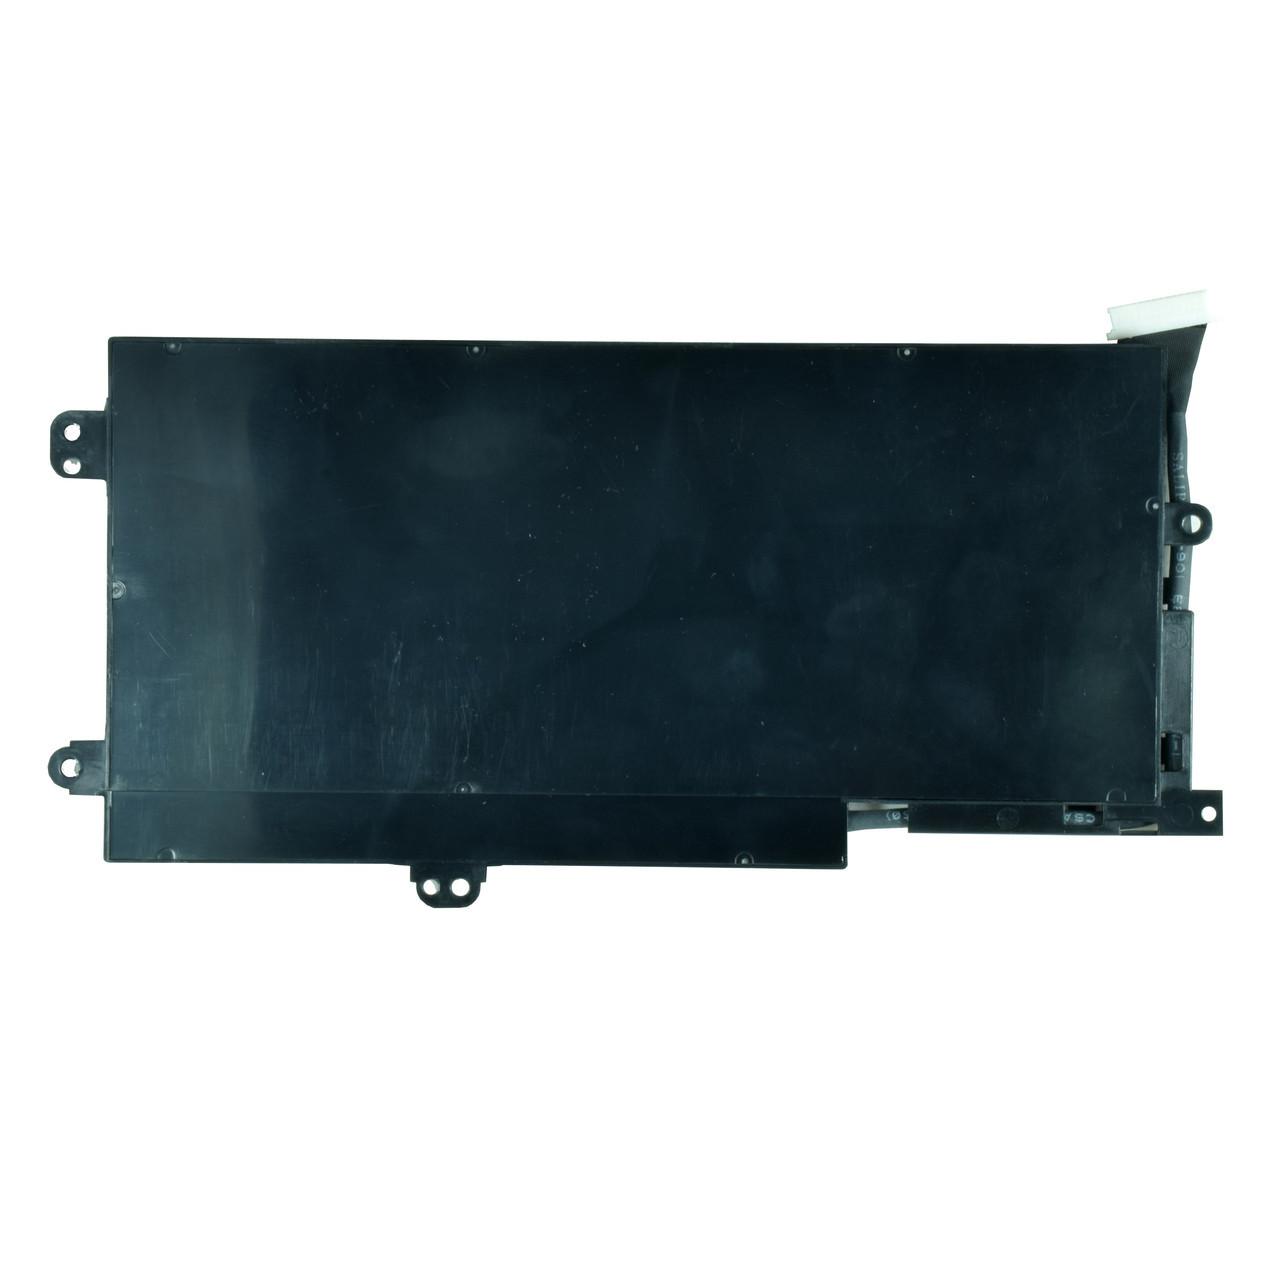 Батарея для ноутбука HP PX03XL HSTNN-DB4P HSTNN-LB4P TPN-C109 TPN-C110 TPN-C111 714762-271